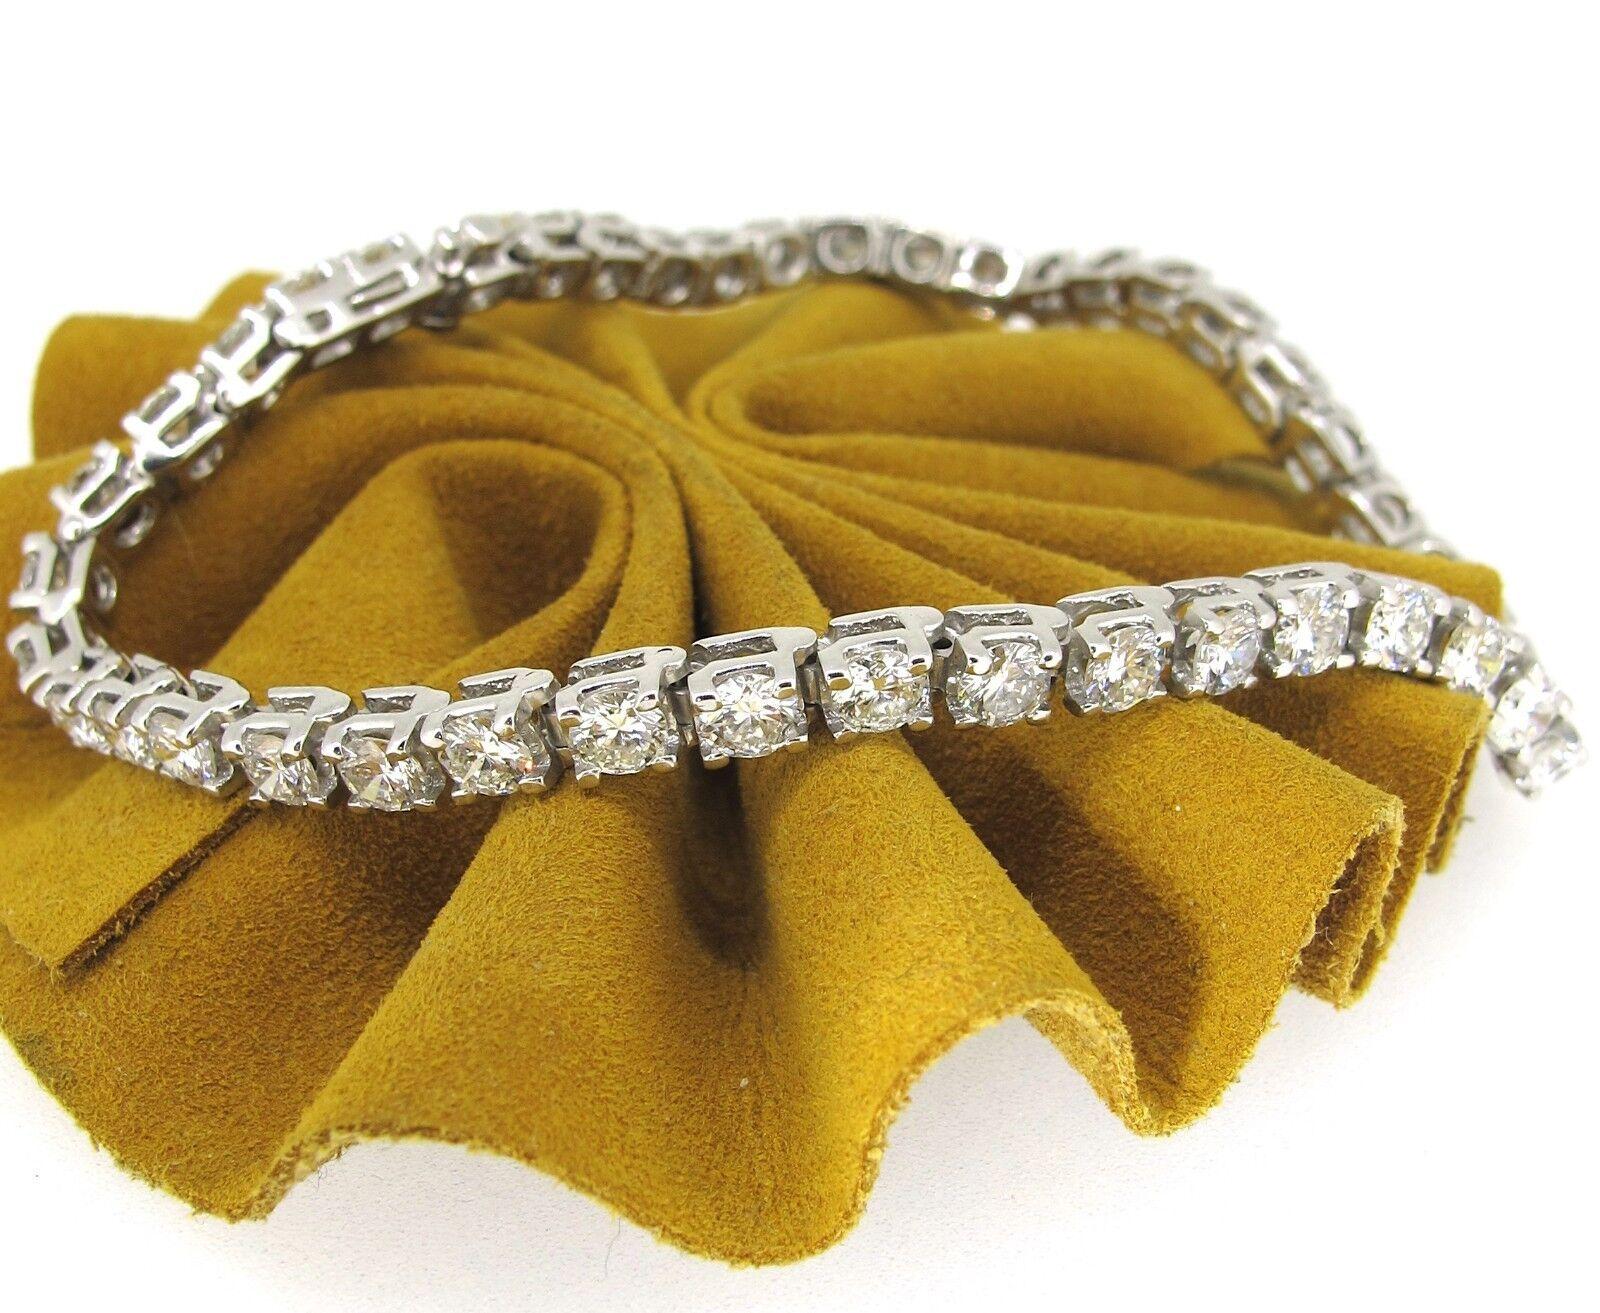 7.48 ct tw Diamonds Round Brilliant Cut 14k White gold Tennis Bracelet 8''